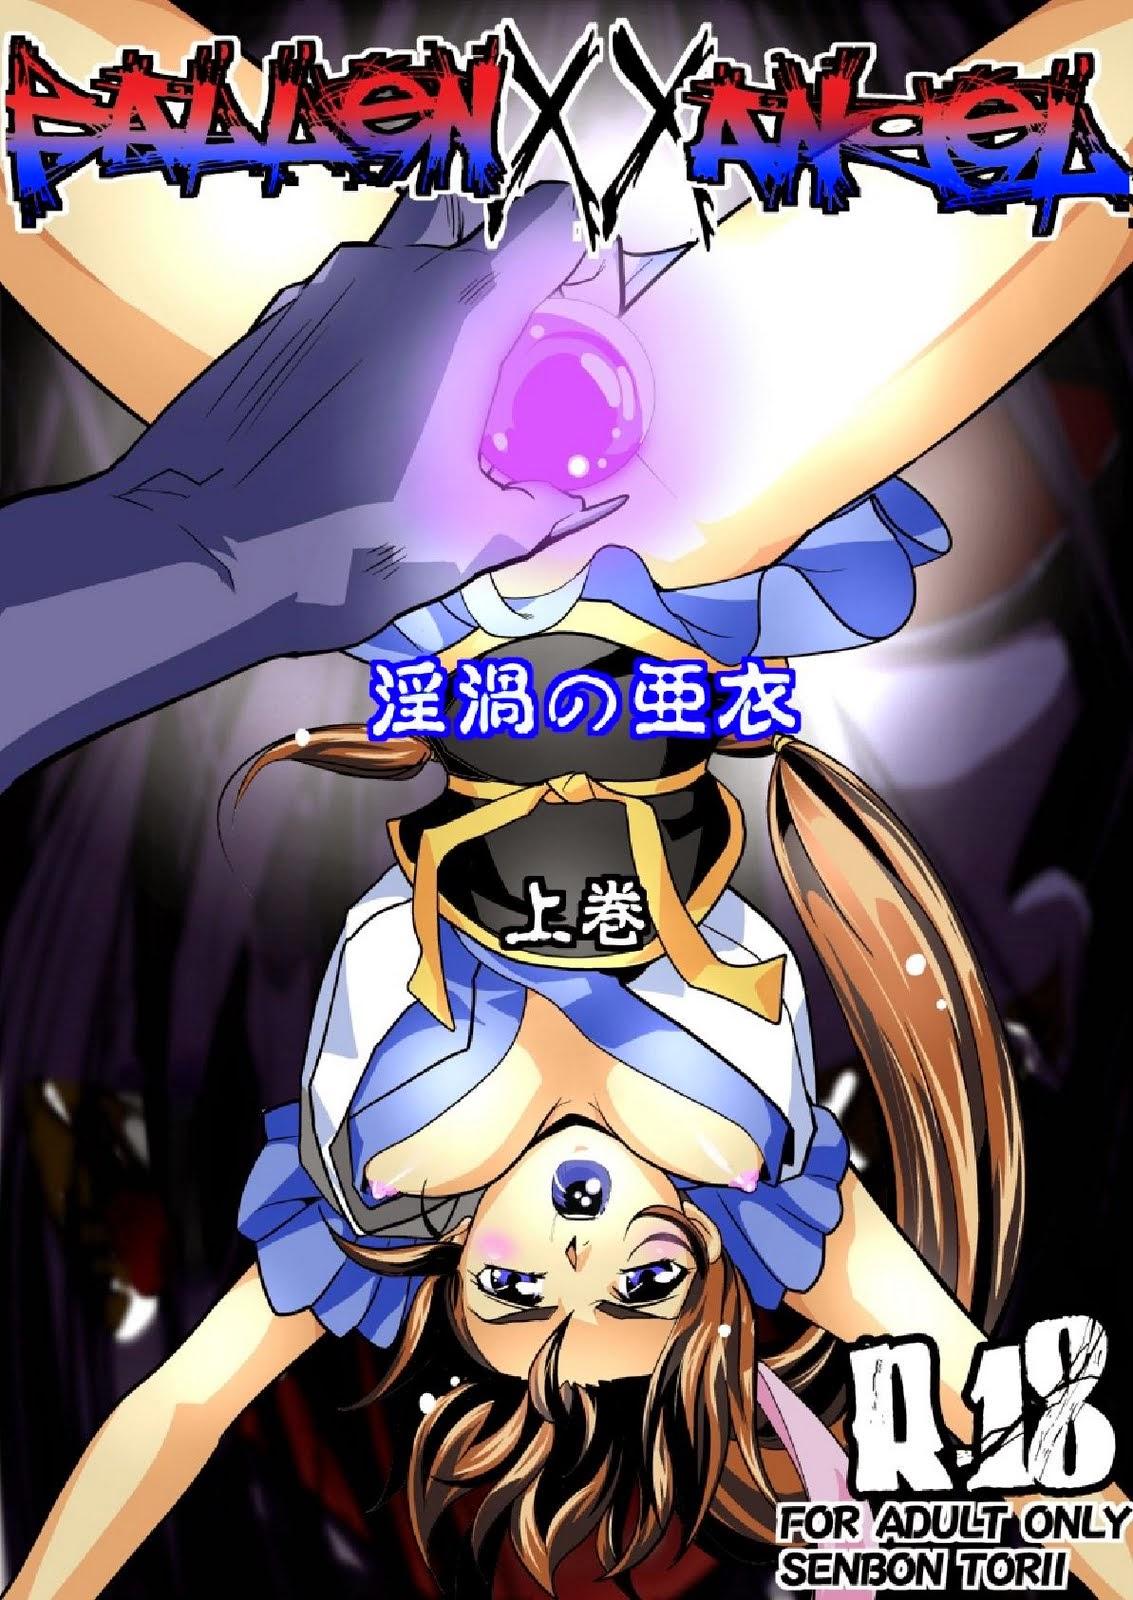 hentai twin-angel uncensored [Senbon Torii] FallenXXangeL 3 Inka no Ai Joukan (Inju Seisen Twin Angels)  [English] [Saha]